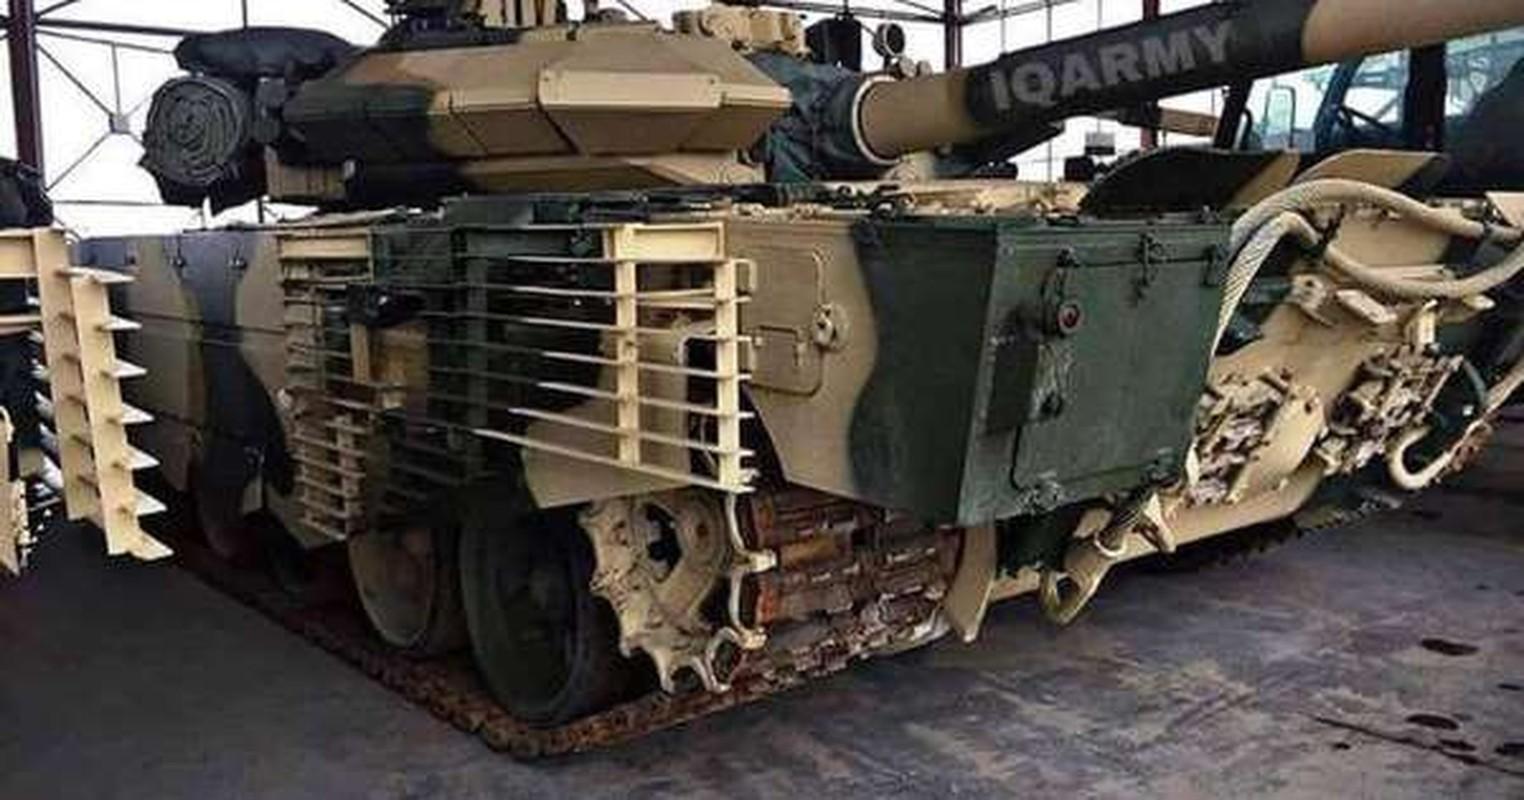 Xe tang Al Kafil-1 cua Iraq duoc Trung Quoc giup nang cap co gi hay?-Hinh-8